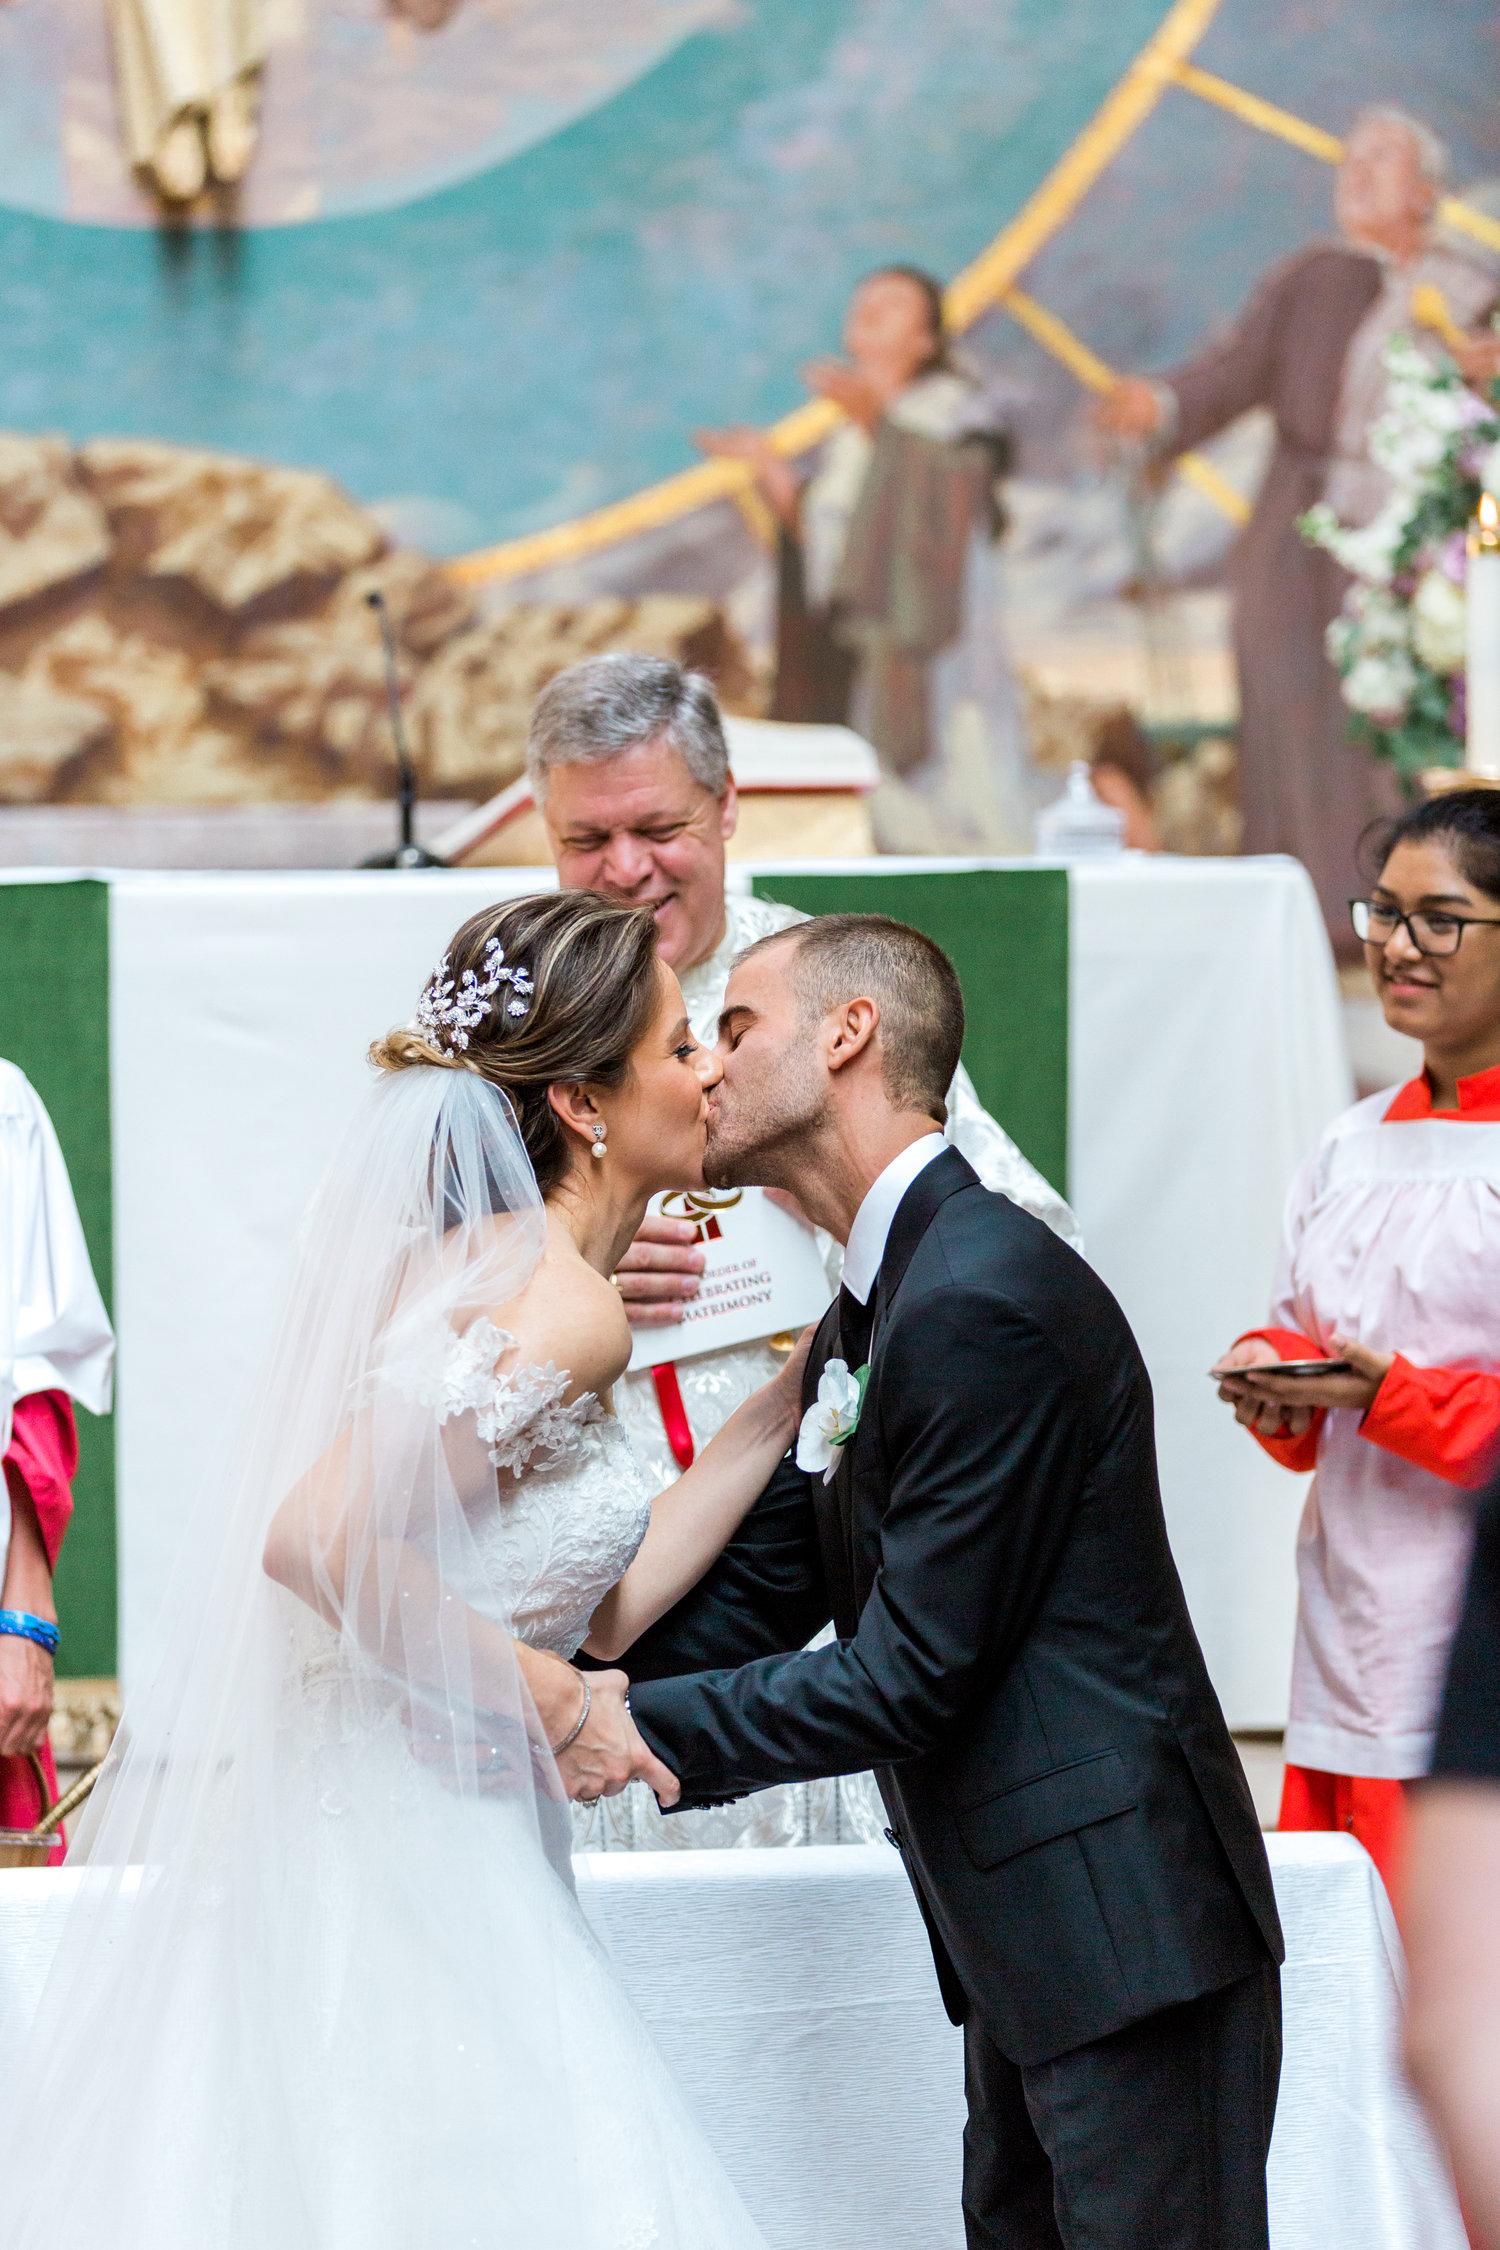 Danielle-Giroux-Amir-Golbazi-Toronto-Wedding-Photographer-Bellvue-Manor_DeLuca_1-409.jpg